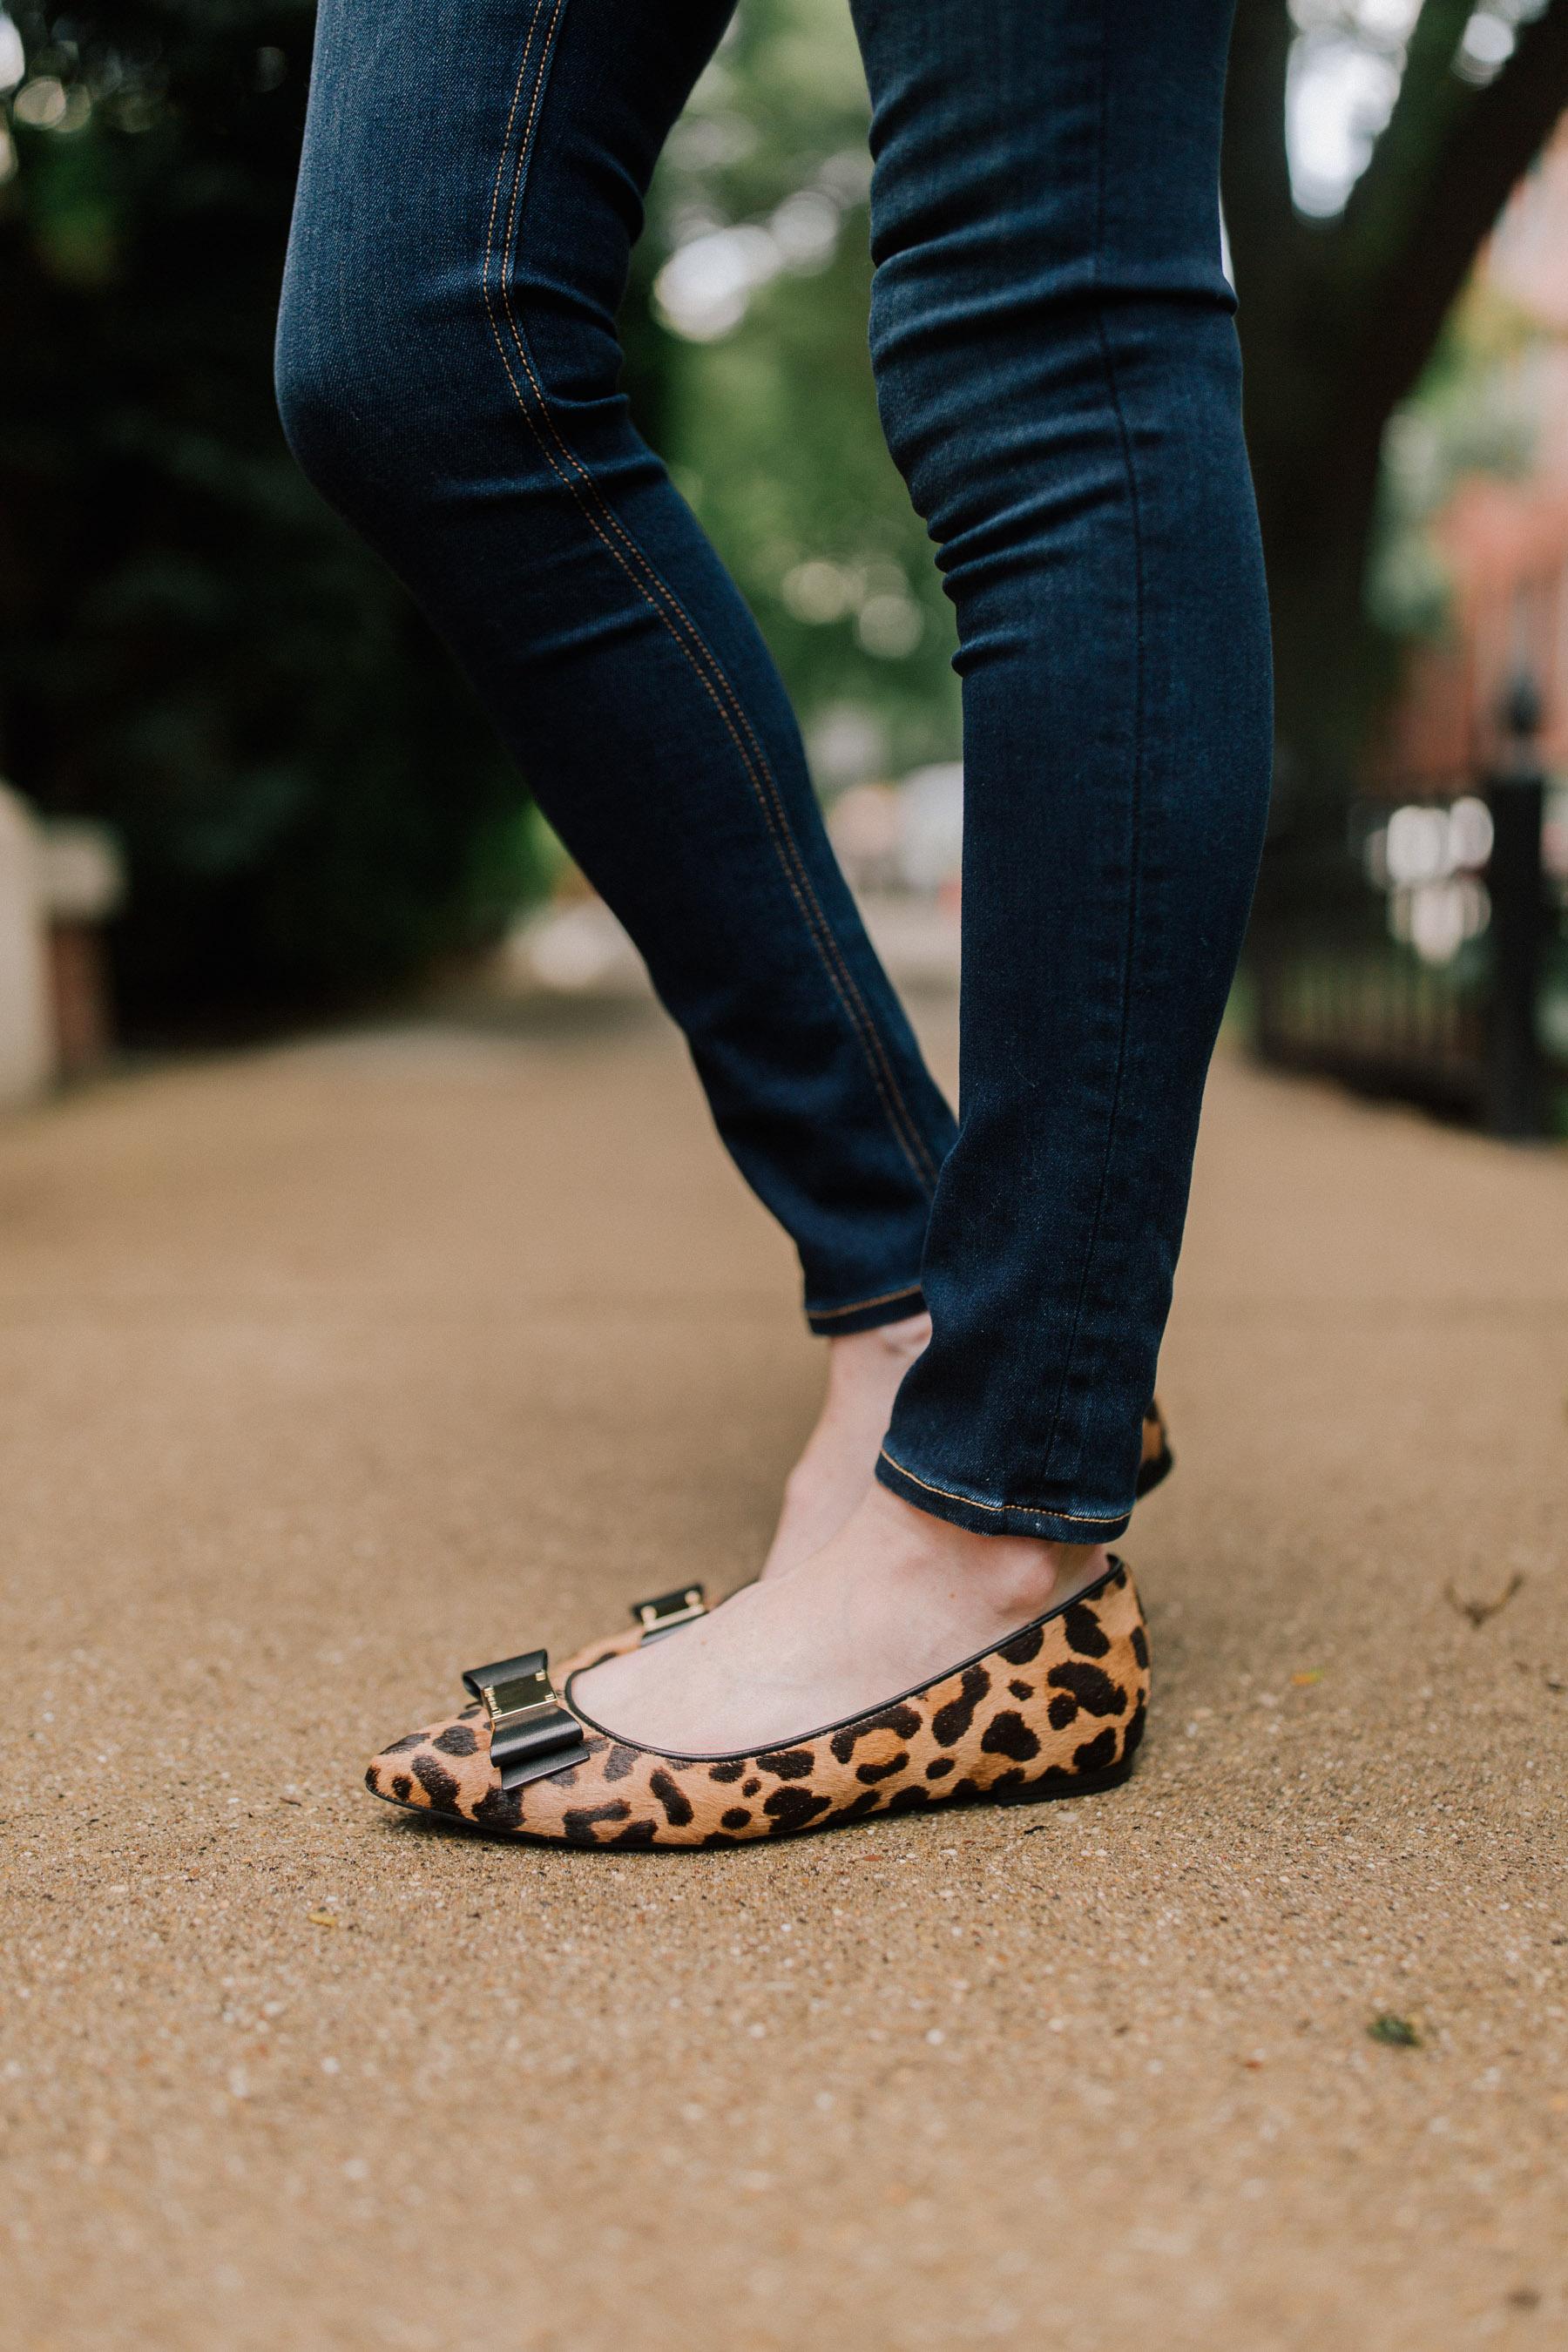 Cole Haan Tali Skimmer Flats /Rag & Bone Skinny Jeans /